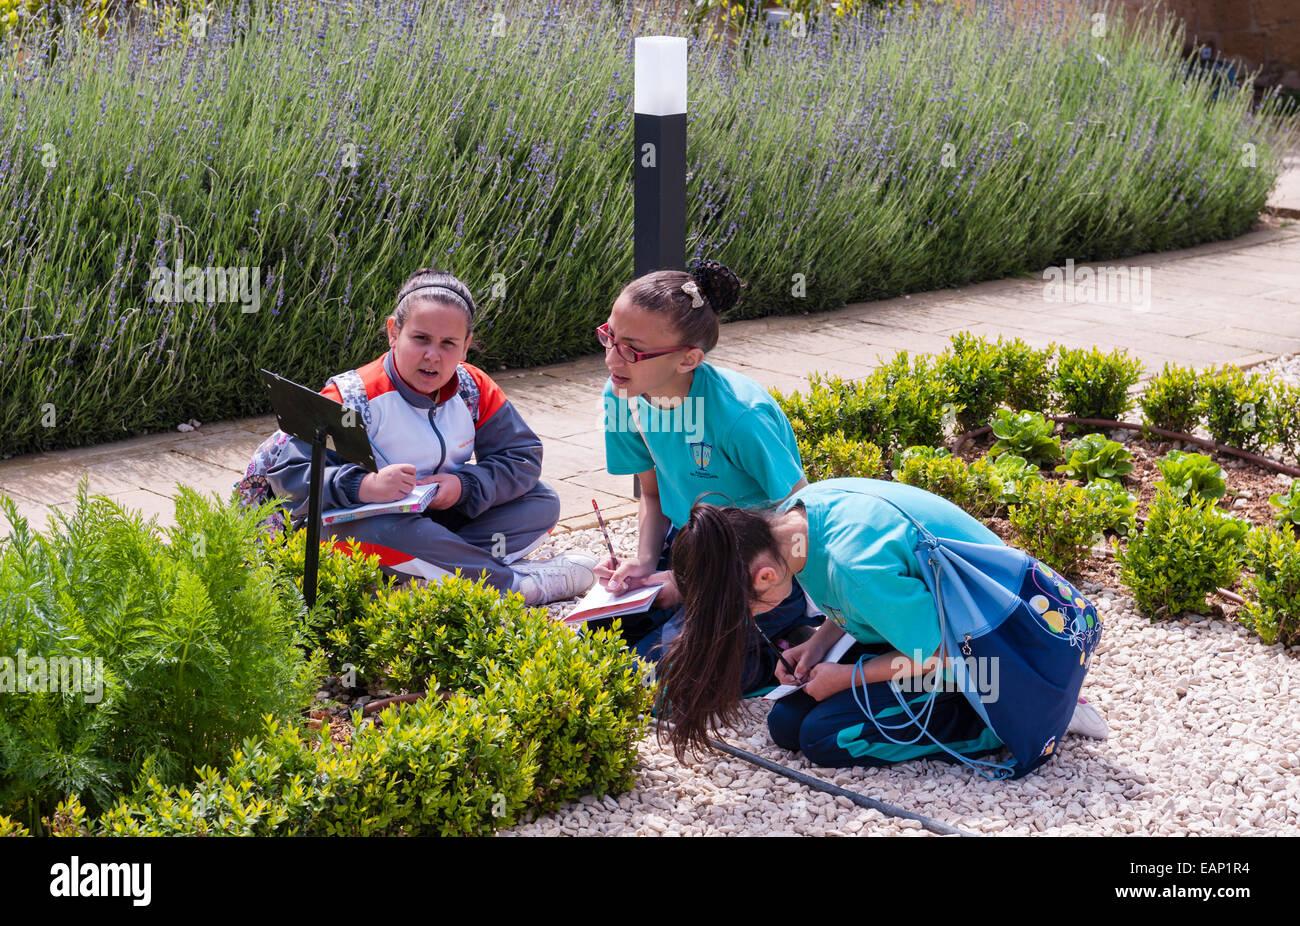 The President's Kitchen Garden, Attard, Malta. Schoolchildren on a botany study trip - Stock Image